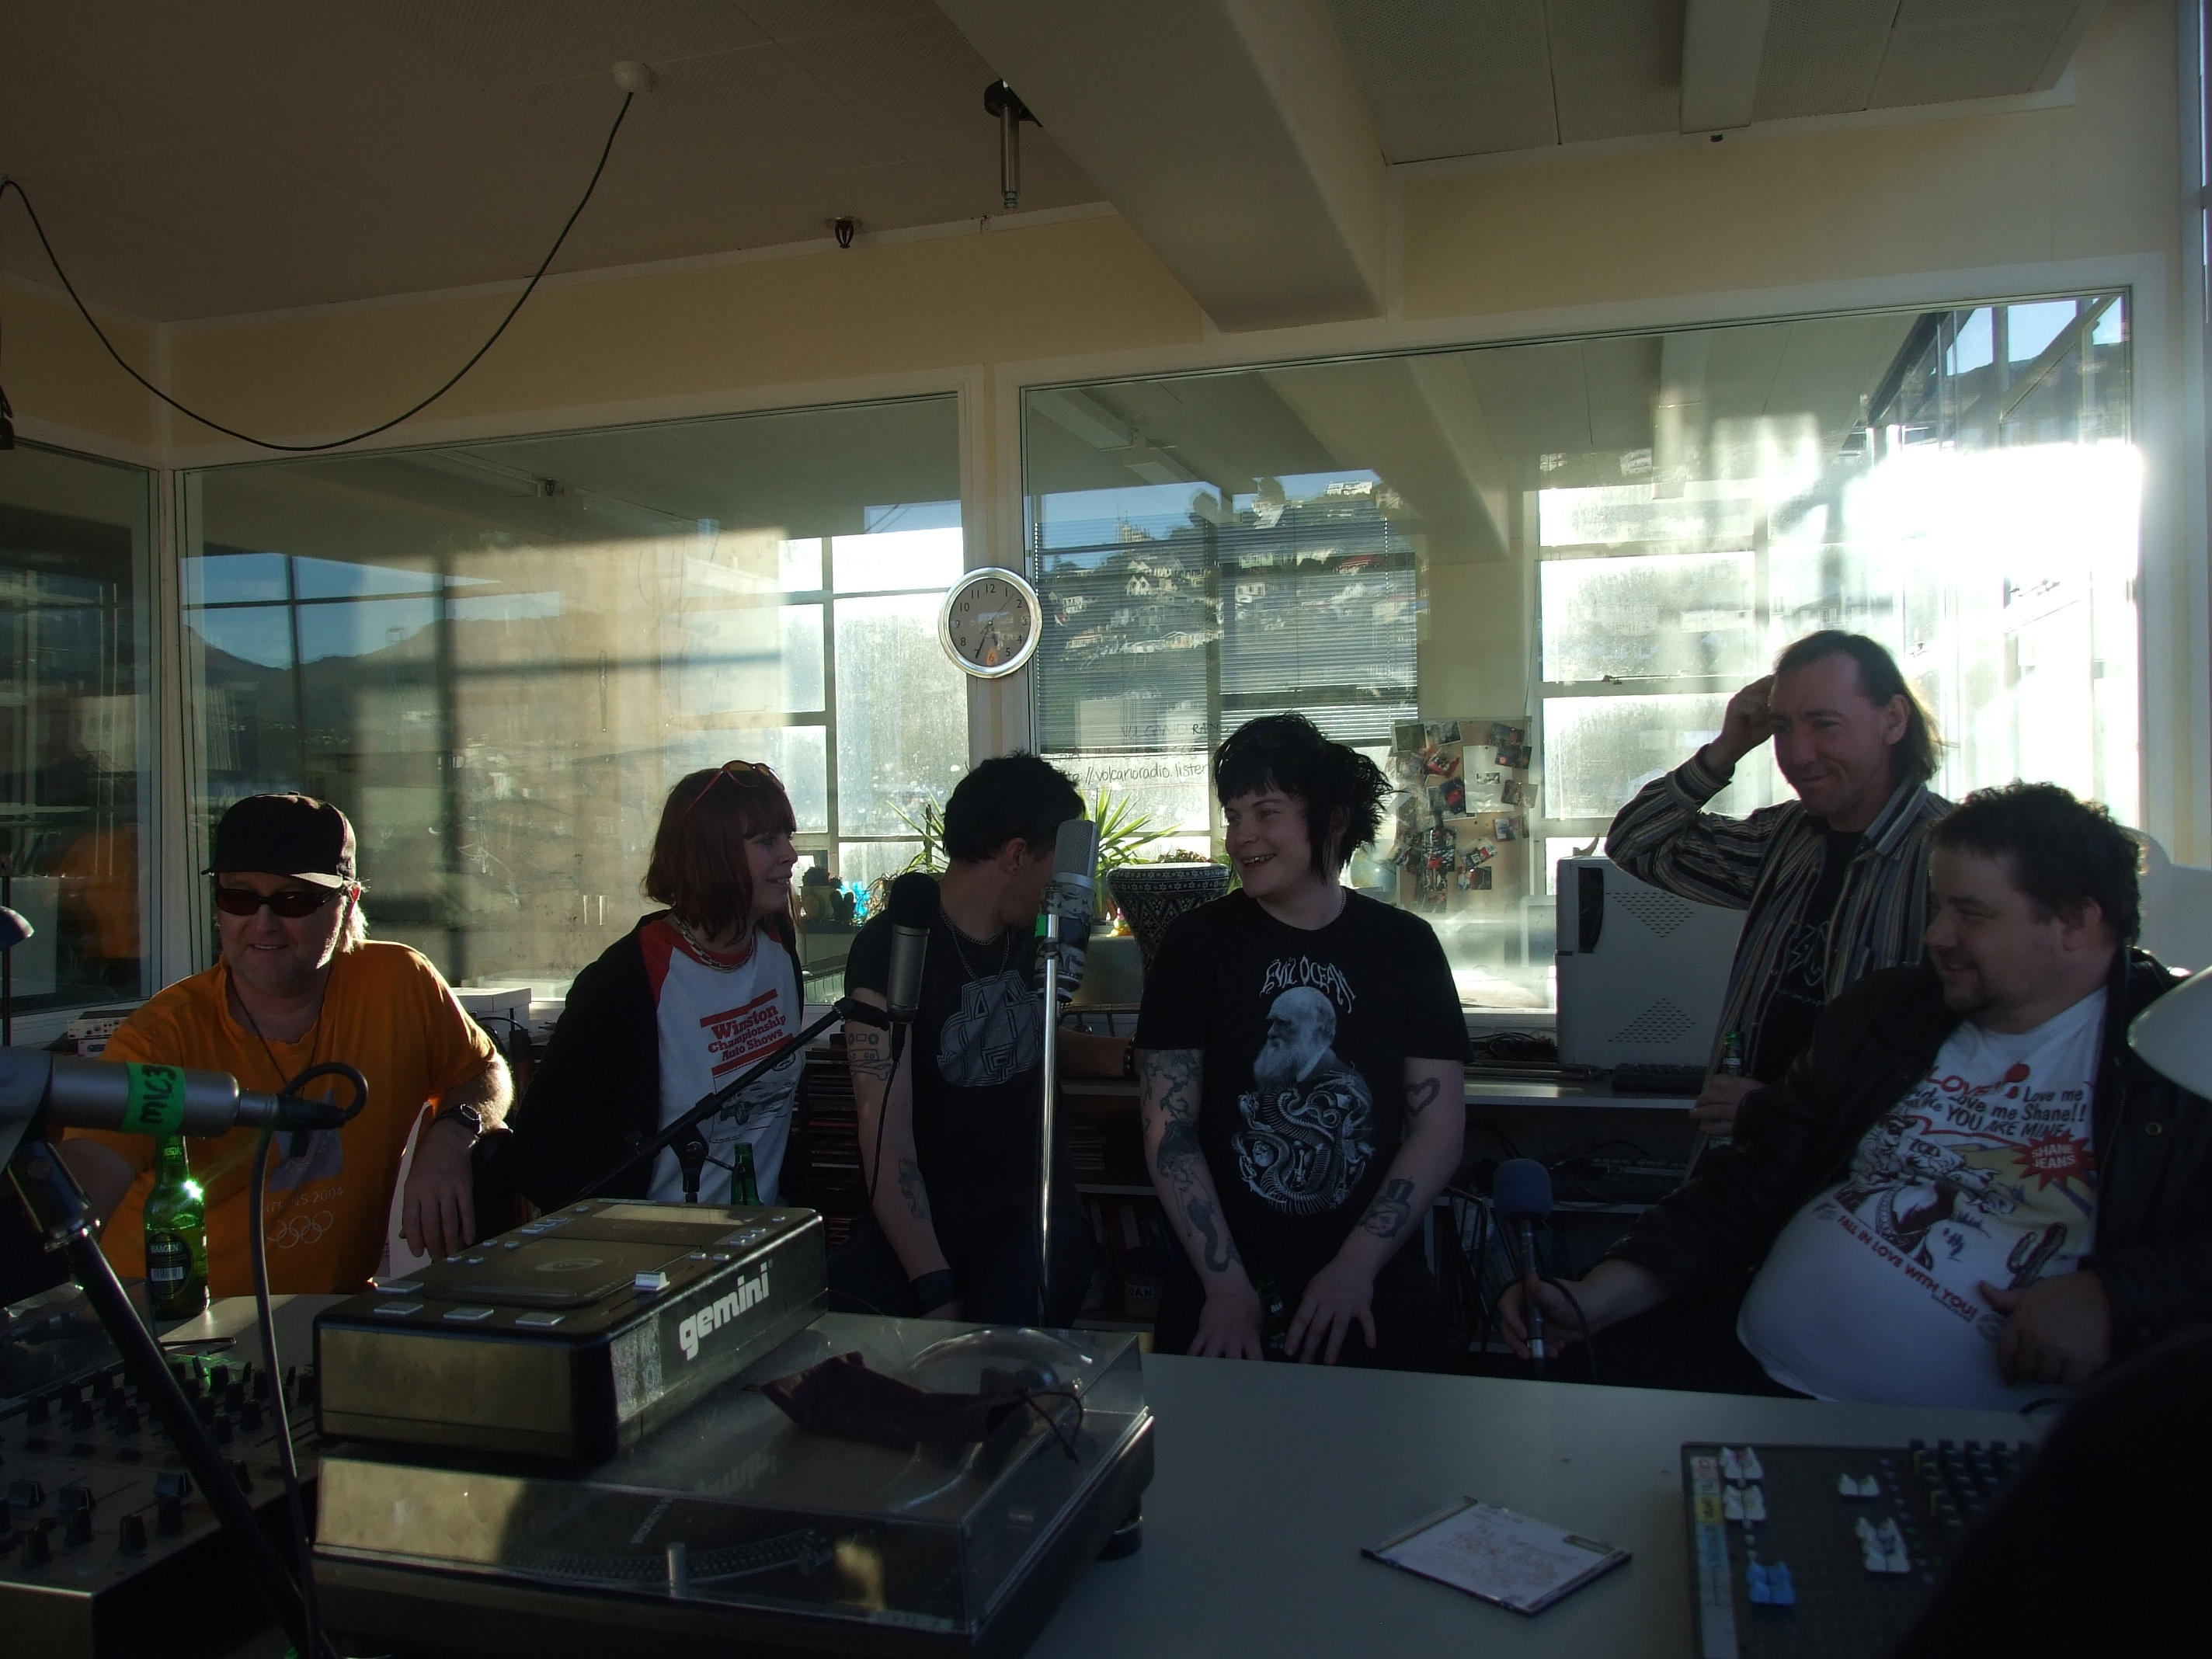 Axemen / Hairdos at Radio Volcano, Lyttelton September 2009